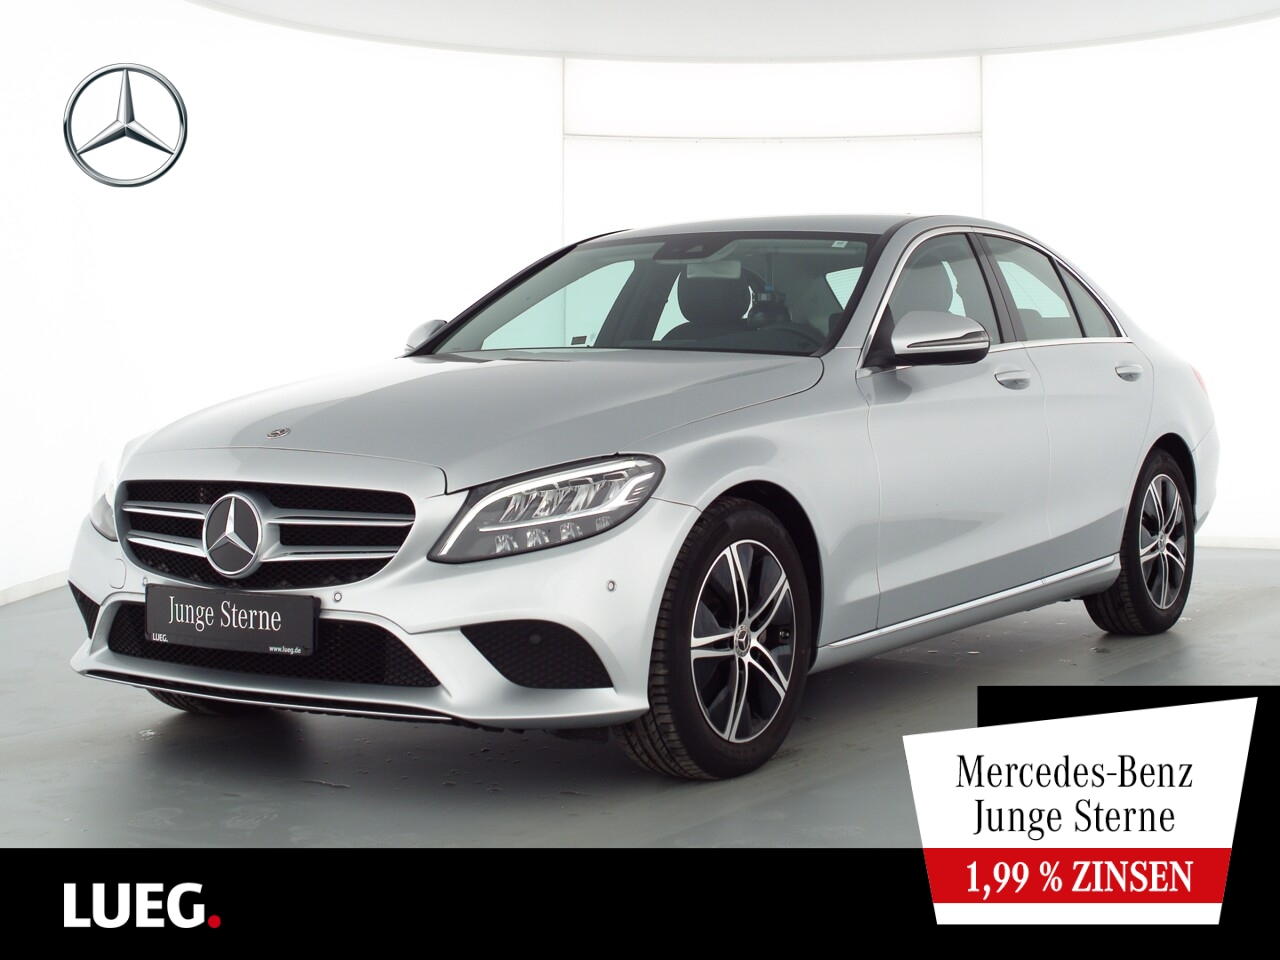 Mercedes-Benz C 200 d Avantgarde+Navi+LED-HP+SpurP+ParkAss+RFK, Jahr 2020, Diesel